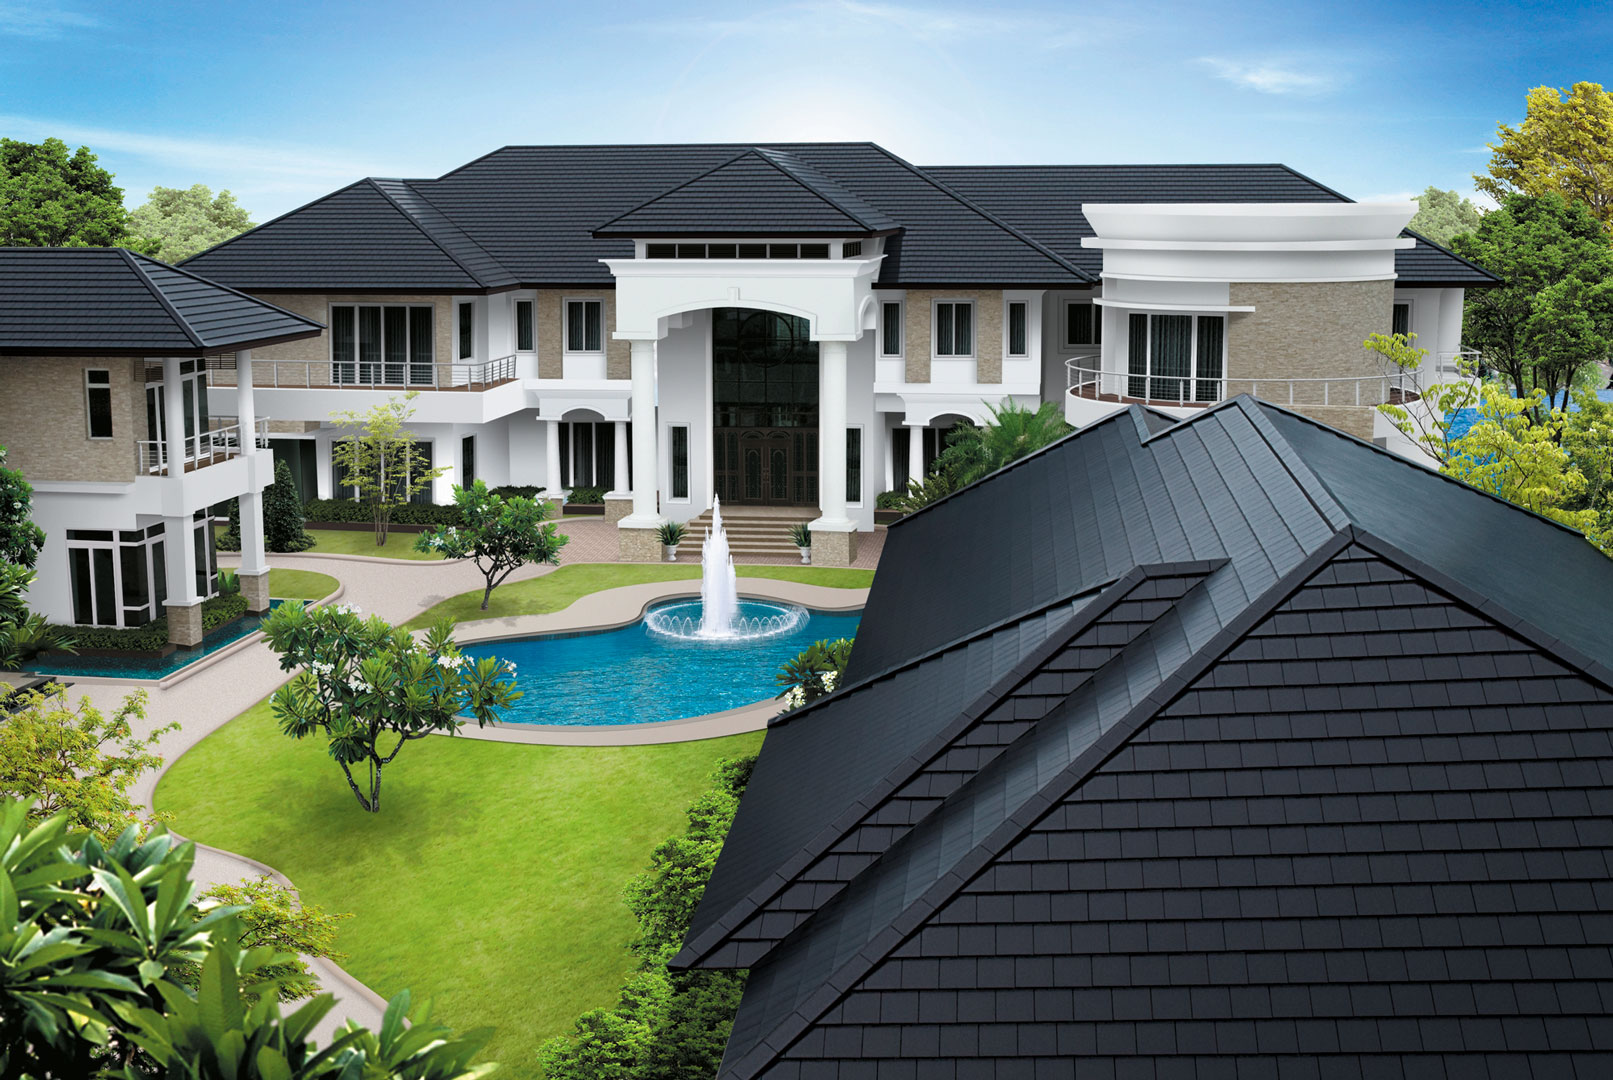 SCG Excella Modern - High quality modern ceramic roof